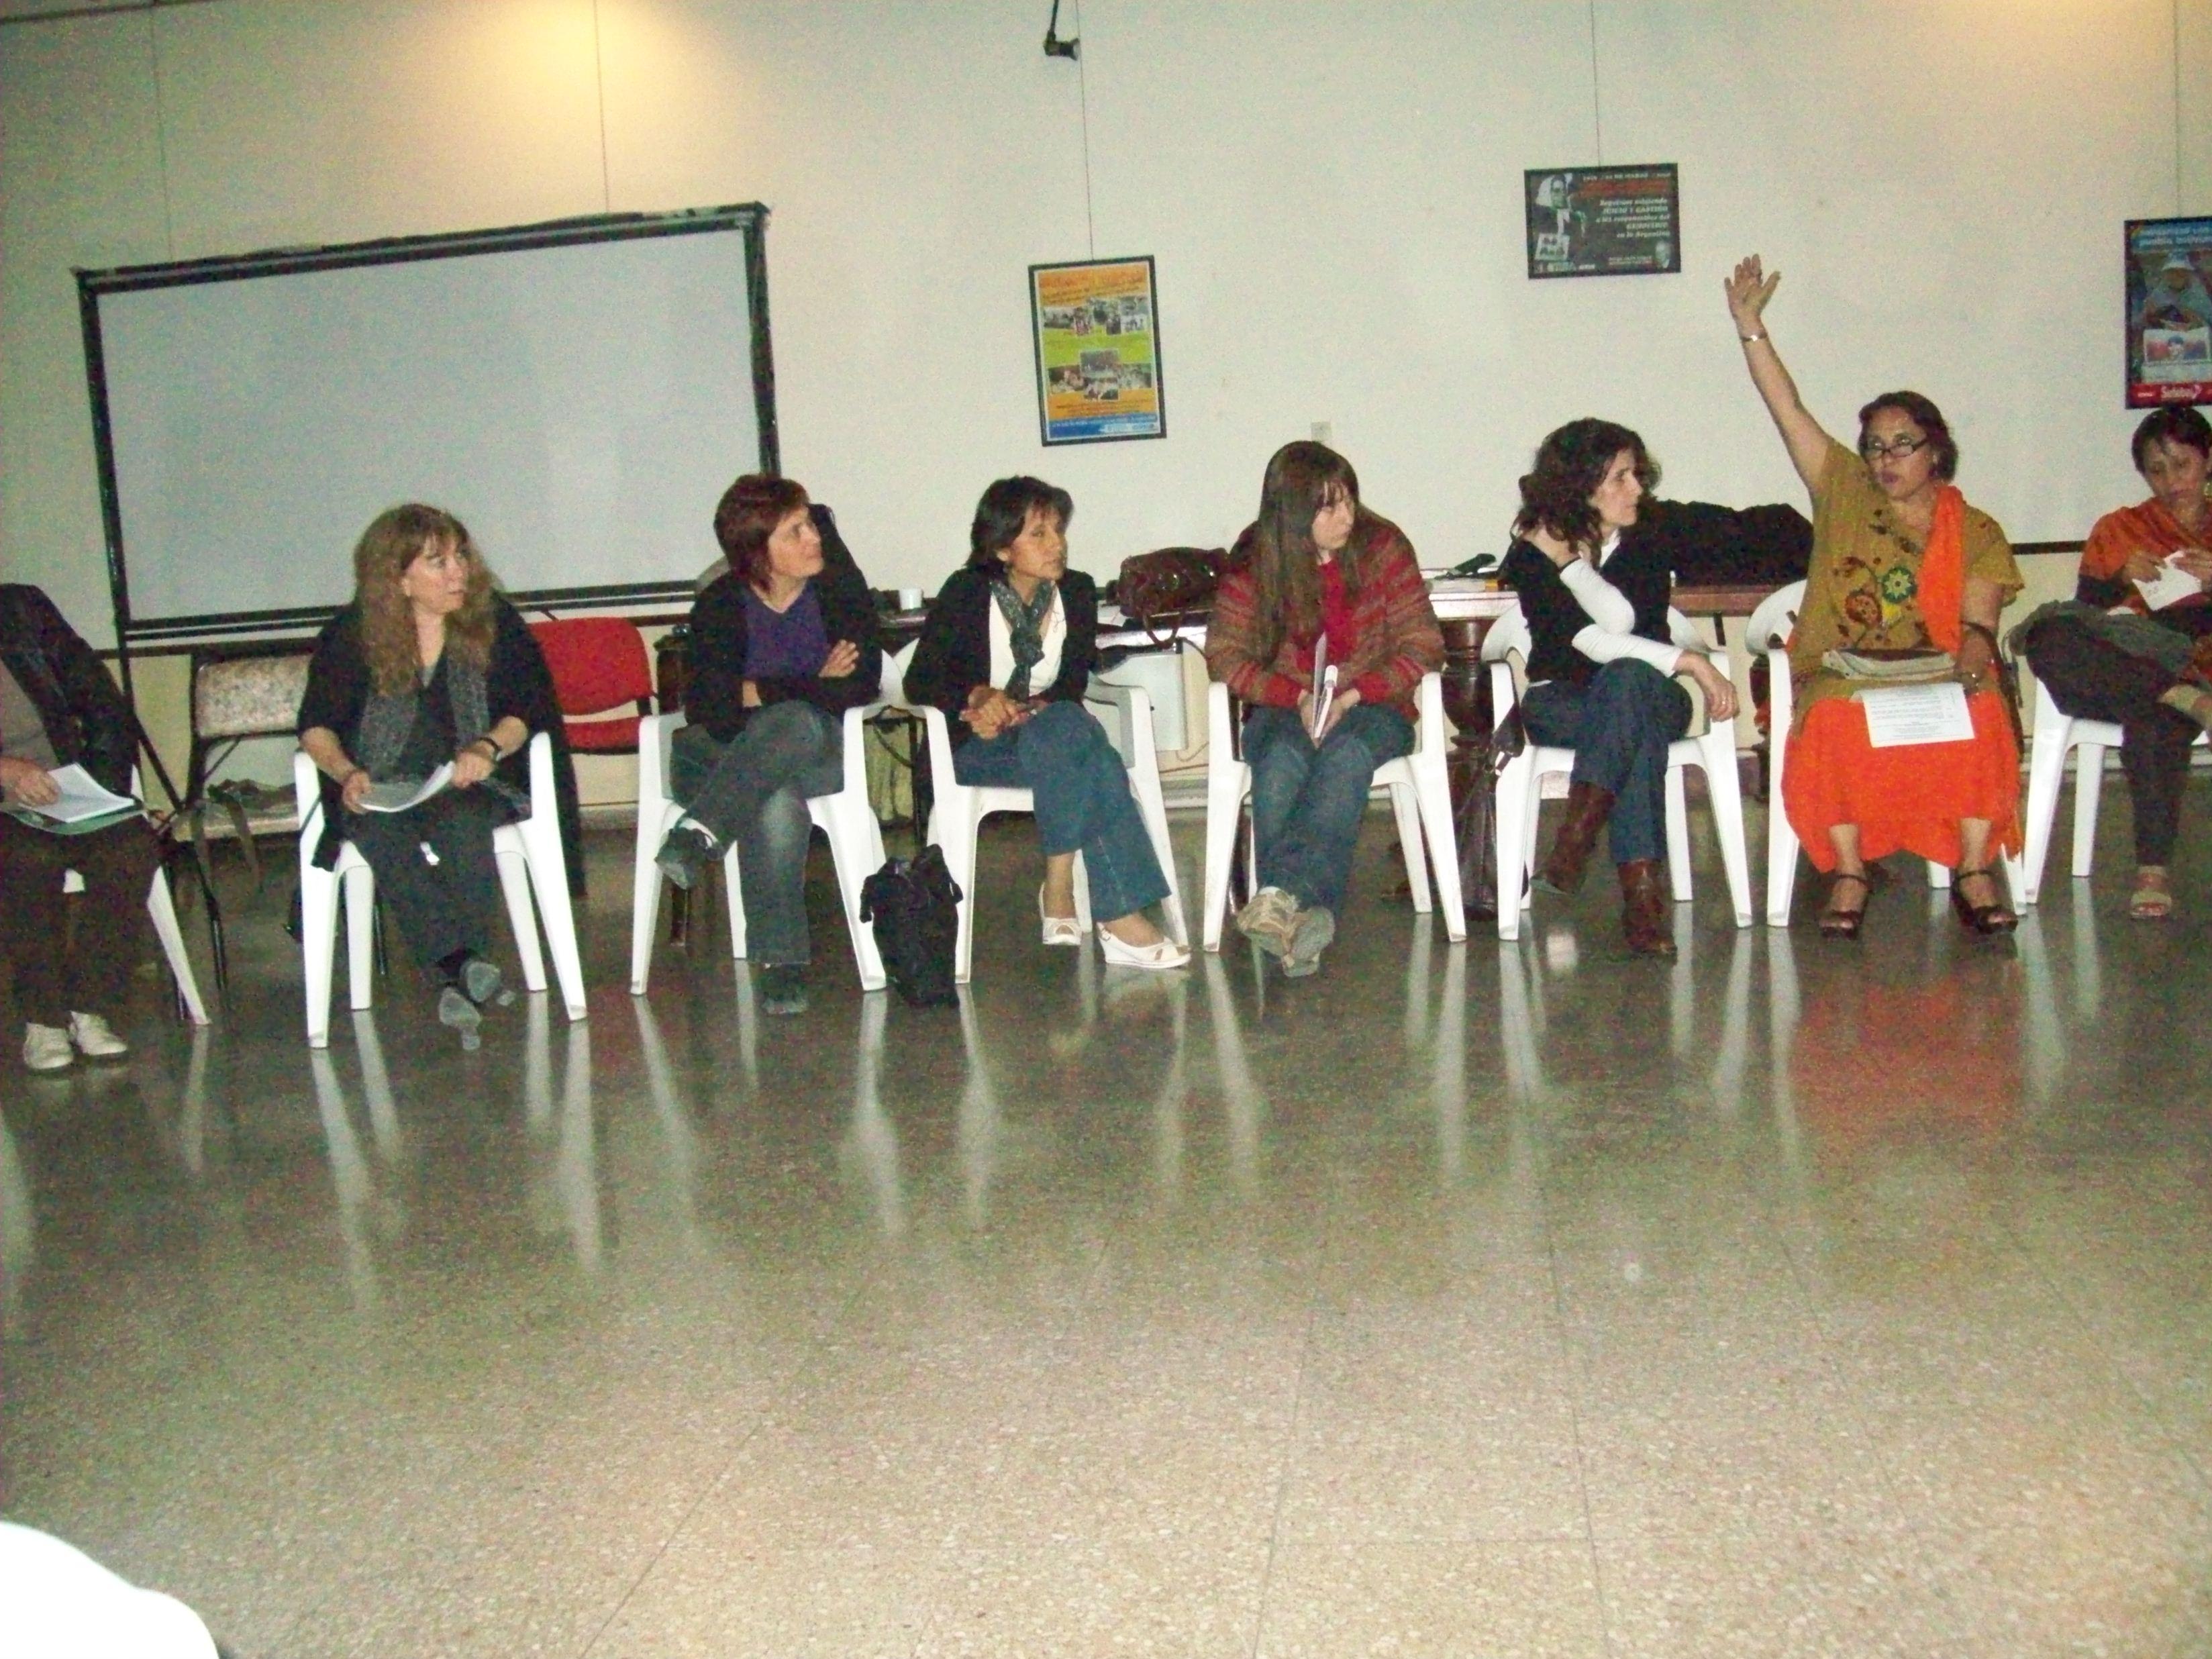 IV Encuentro - Santa fe 2009 (4)